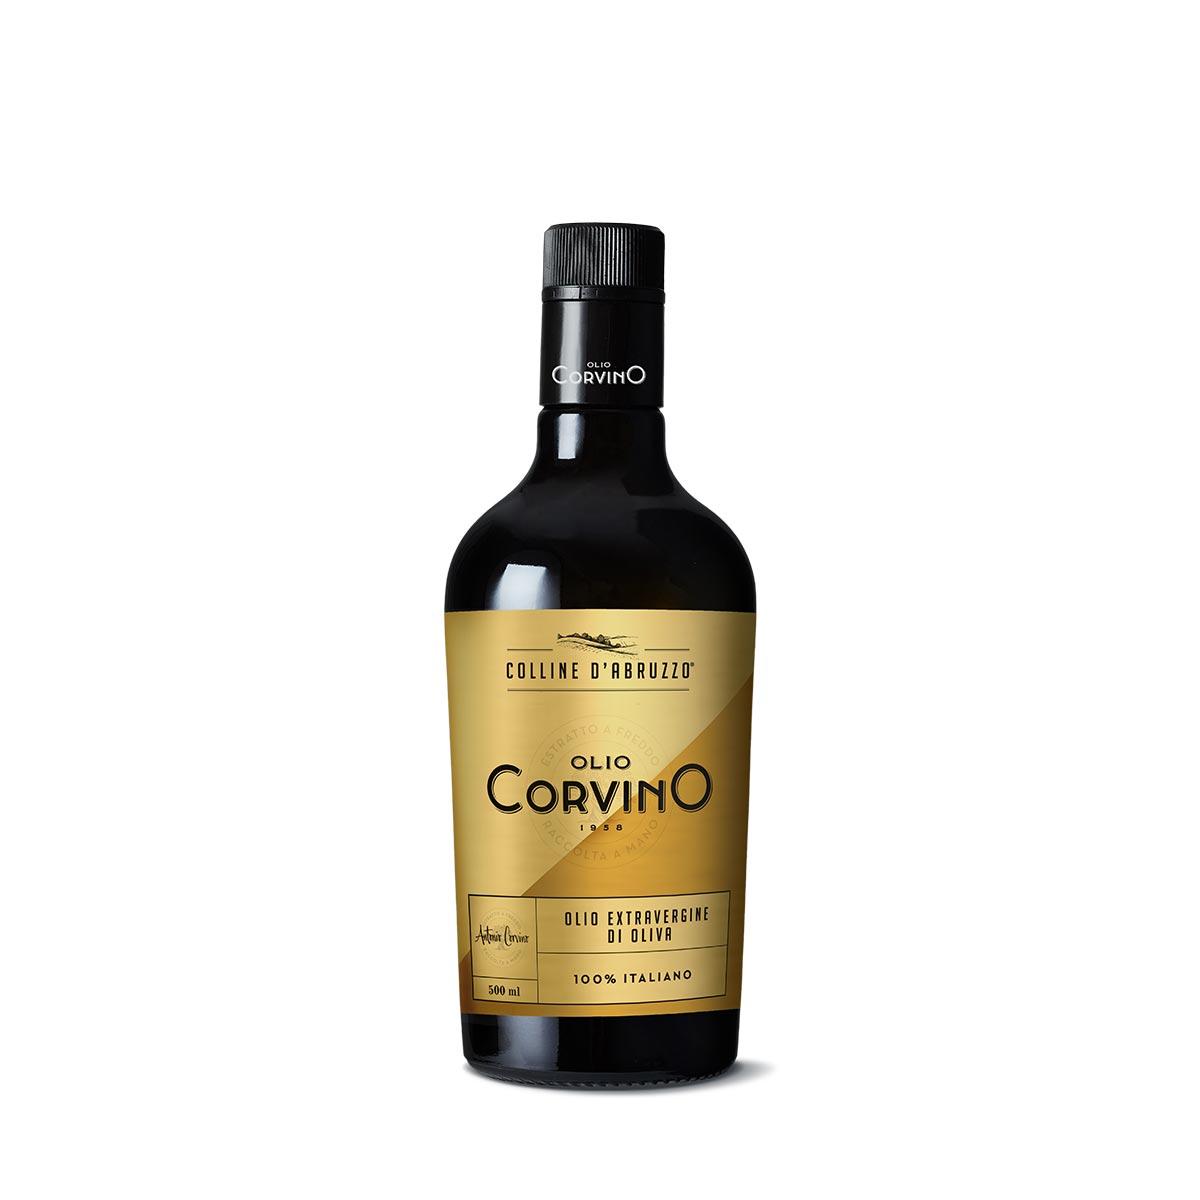 n.6 bottiglie Colline d'Abruzzo 500ml